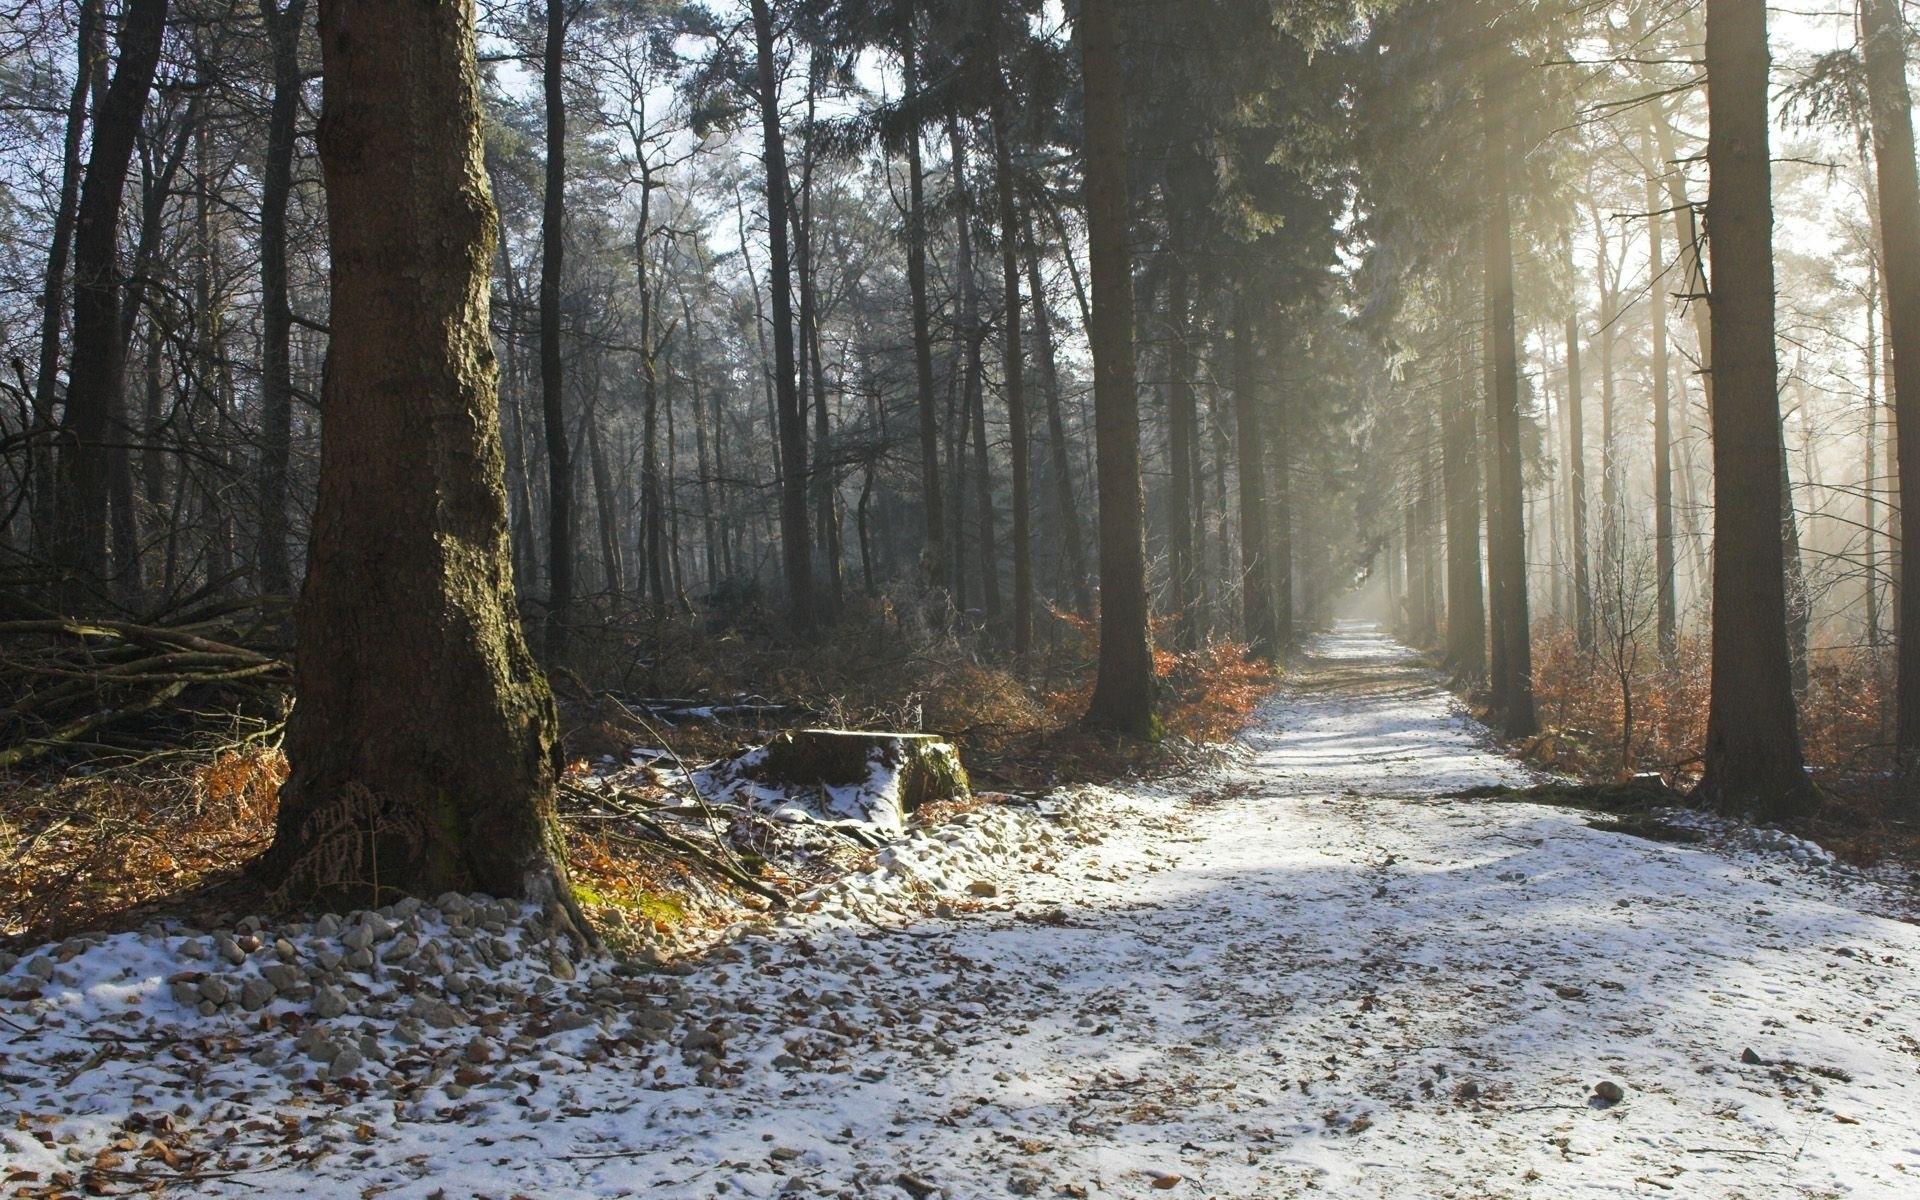 Nature landscapes trees forest roads path trail sunlight sunbeam fog haze  winter snow seasons wallpaper     27465   WallpaperUP